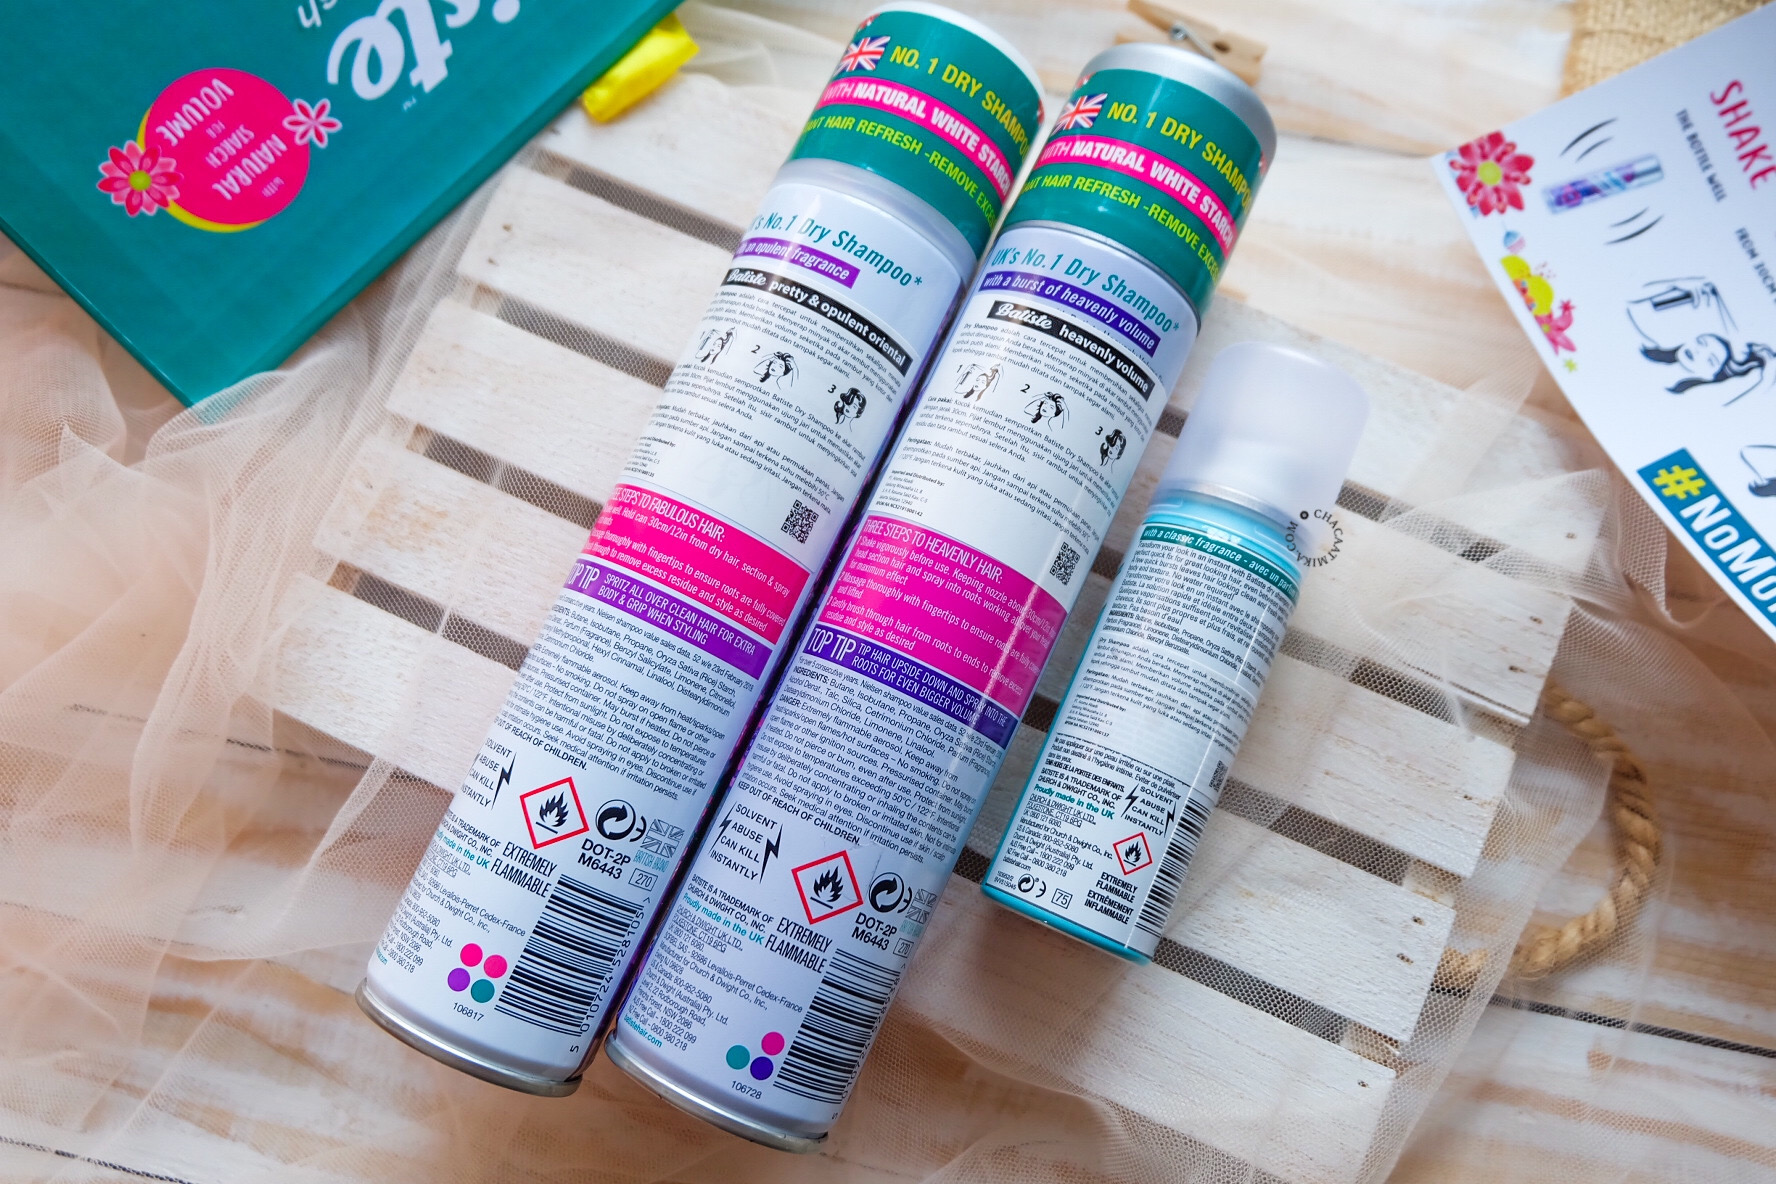 [Review] Batiste Dry Shampoo, Solusi Buat Rambut Lepek